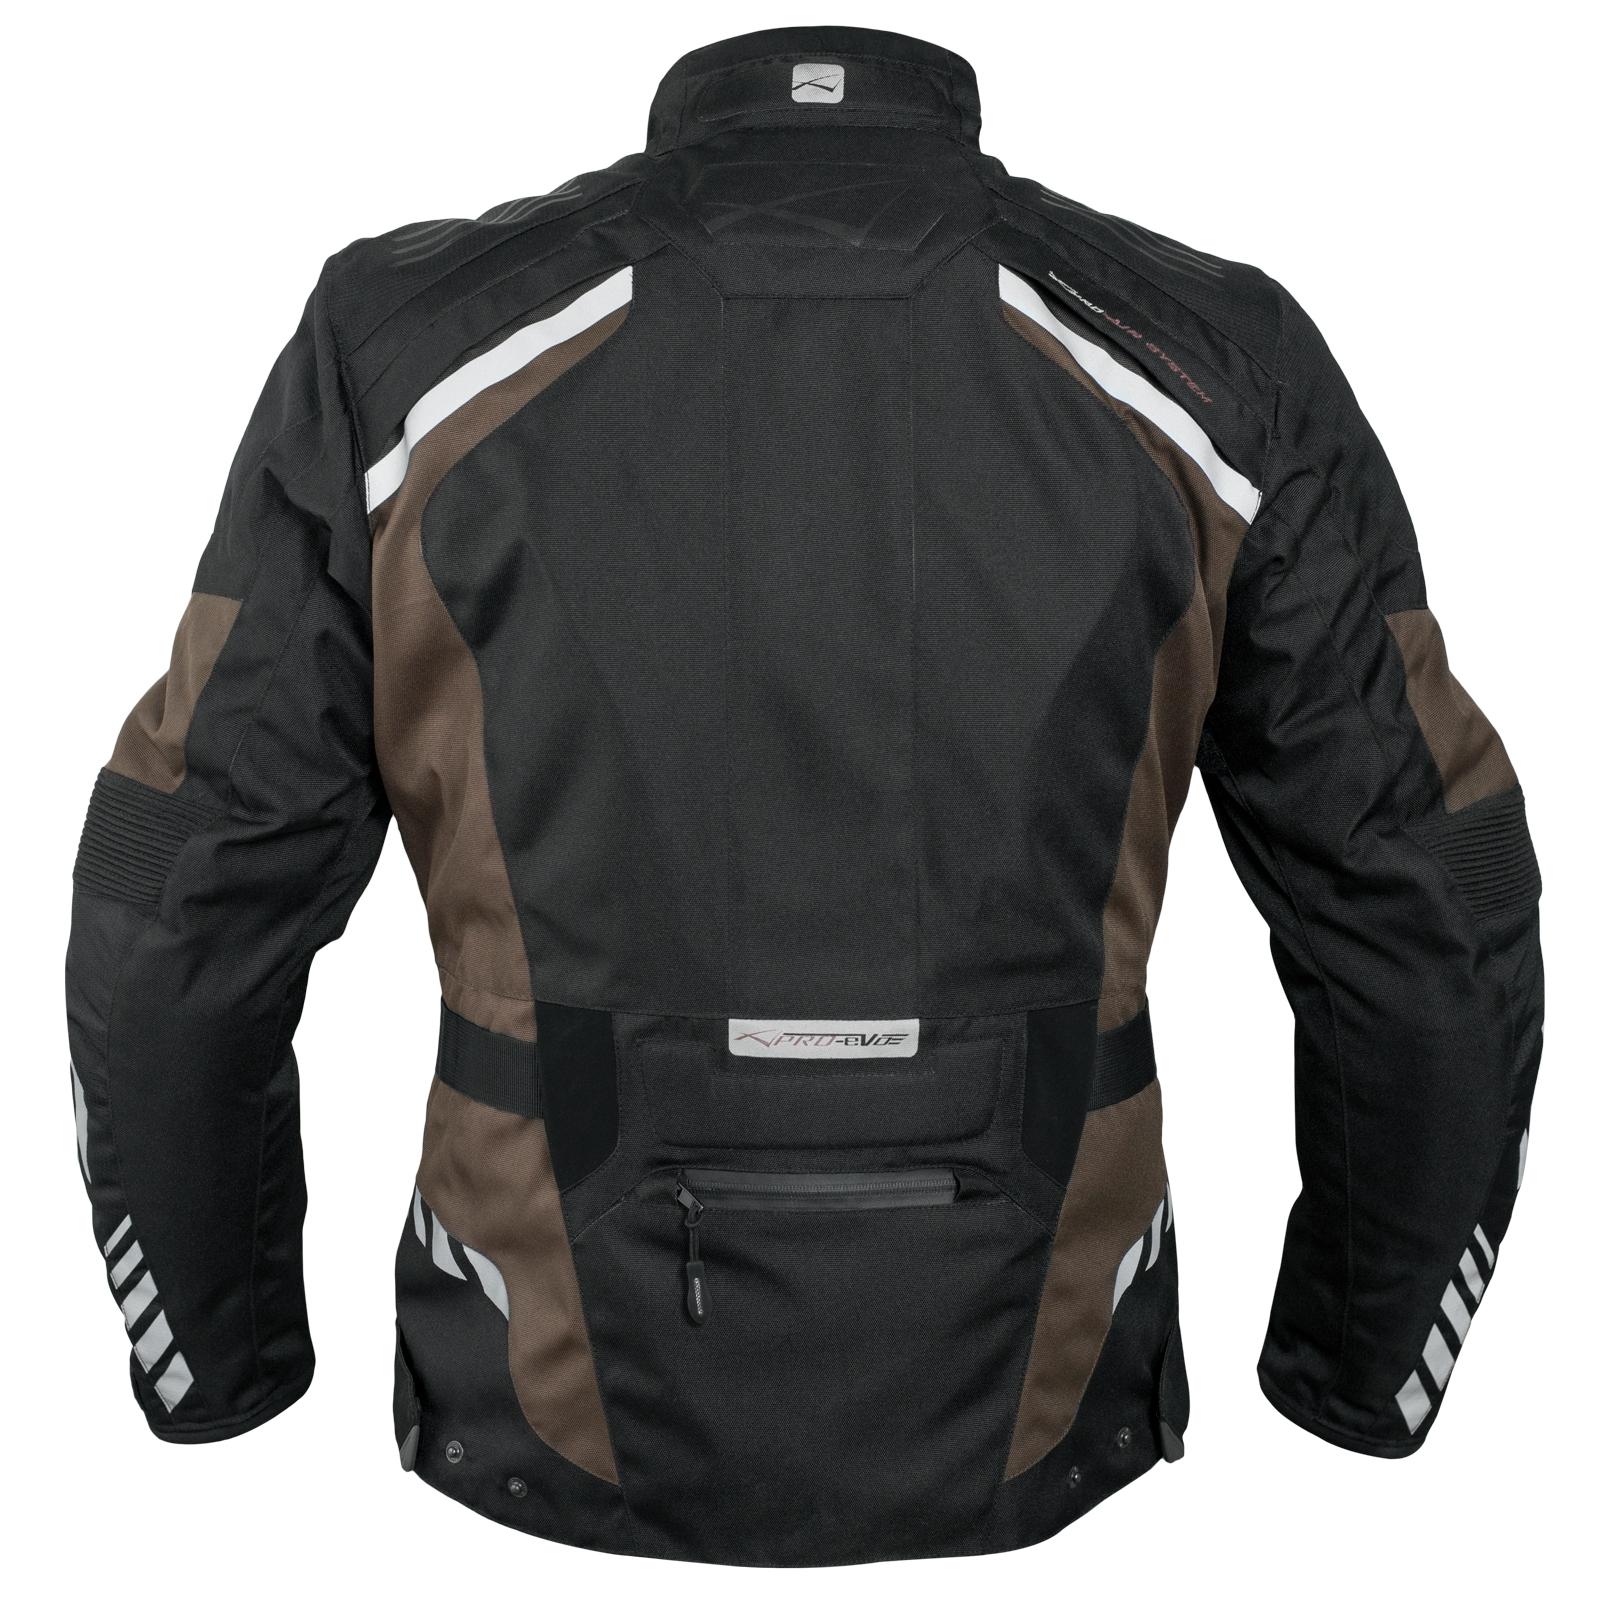 Blouson-Moto-Tissu-Veste-Impermeable-Doublure-Hivernale-Reflechissant-Respirant miniature 8